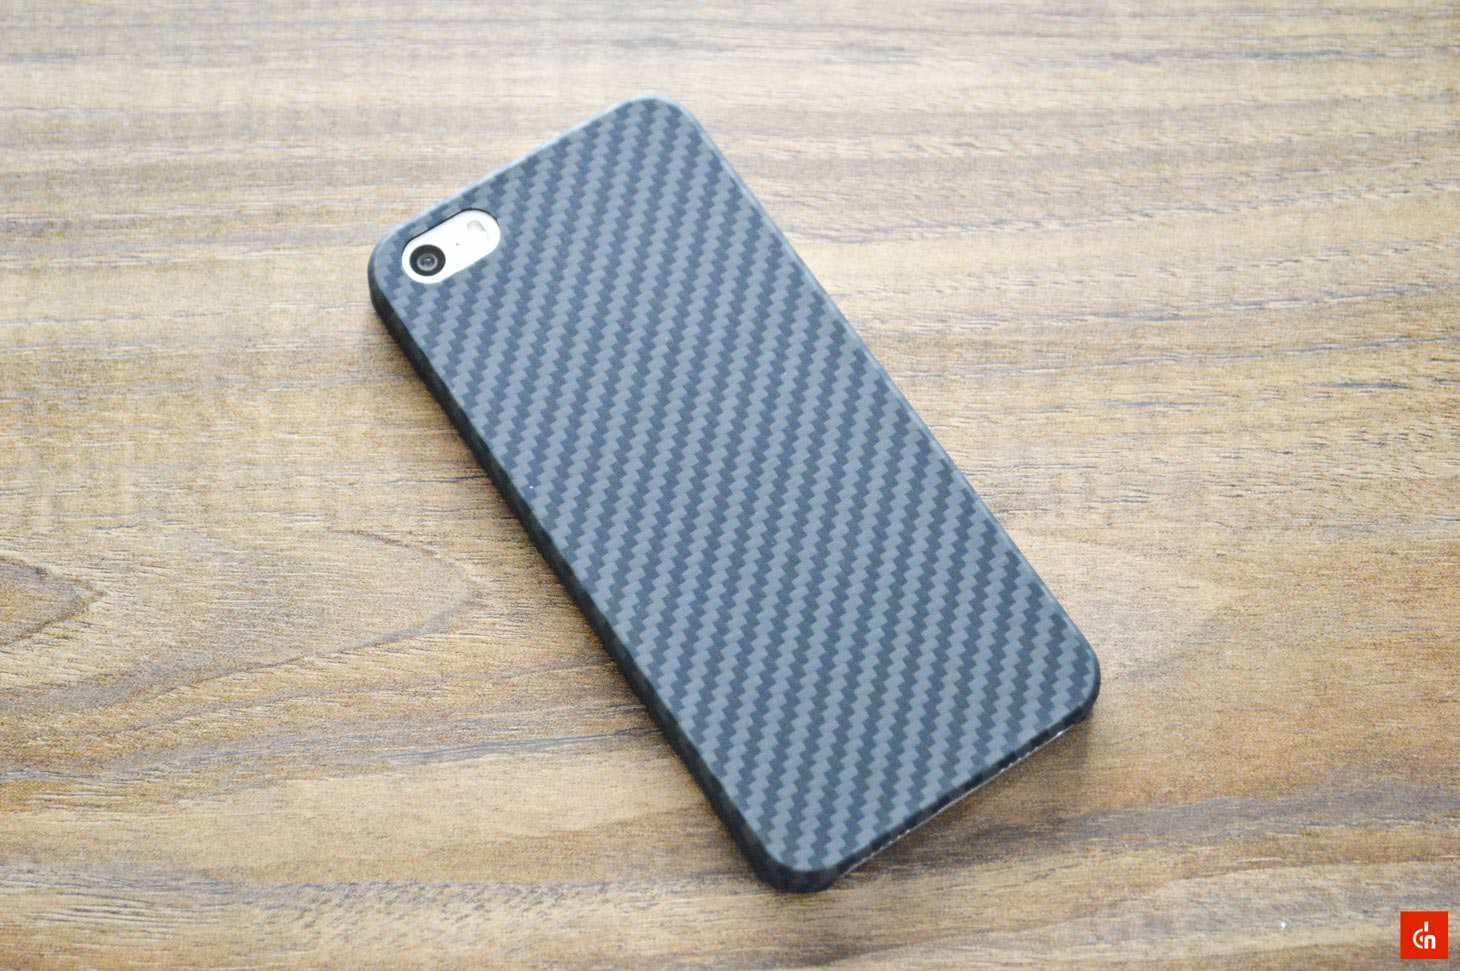 017_20160717_pitaka-carbon-iphonese-case